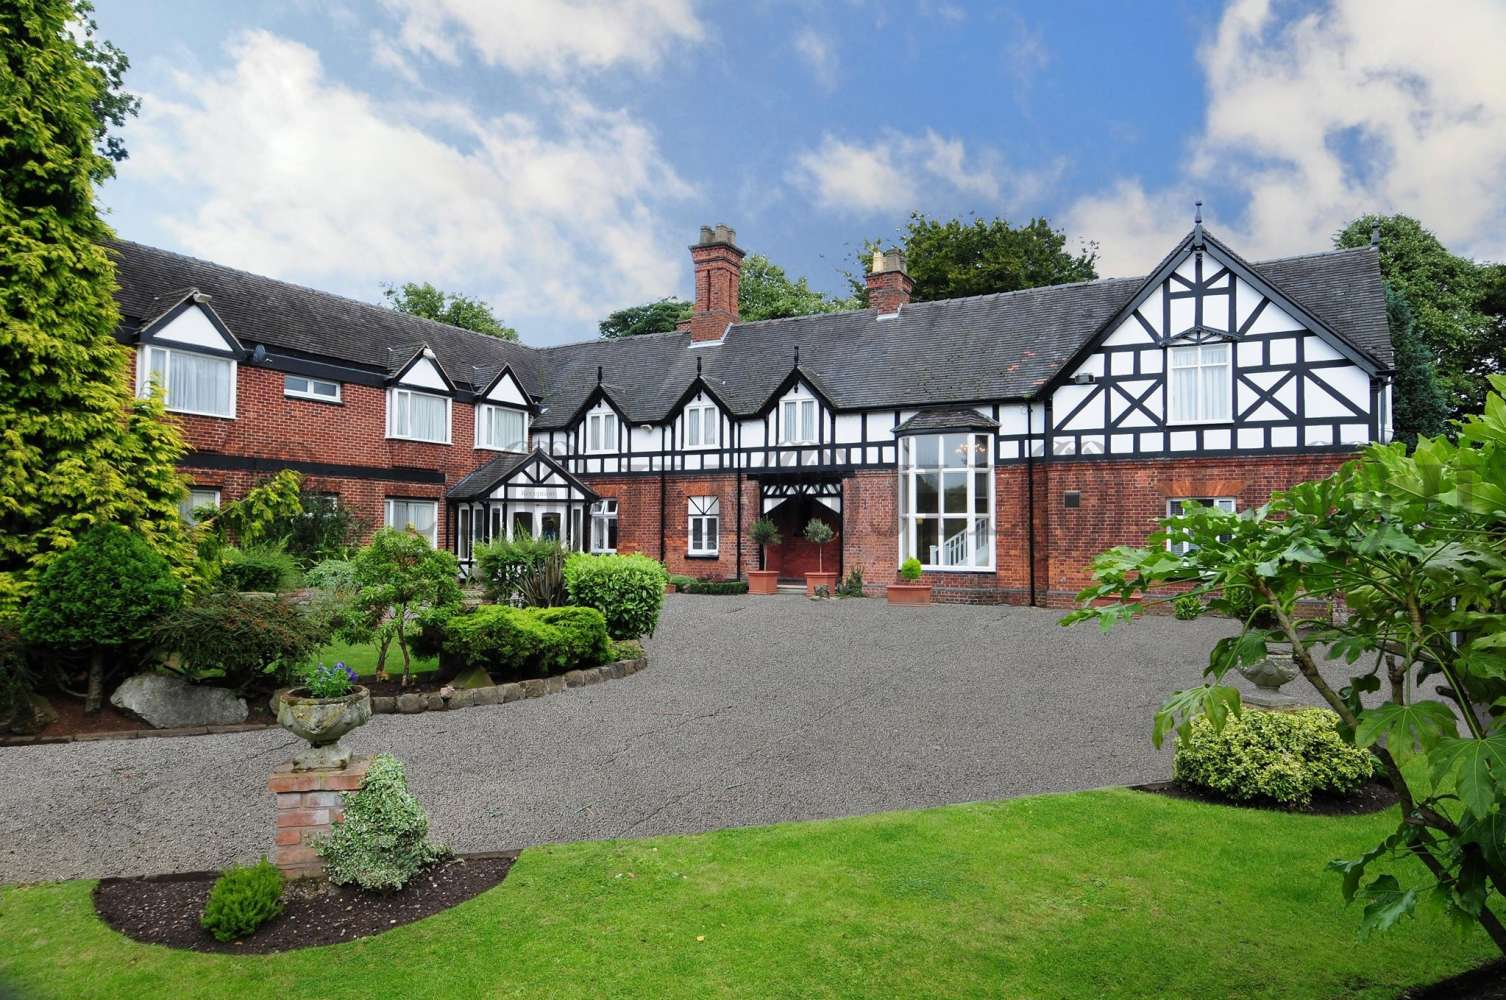 Hotel United kingdom, UK - Project Hermes - 92081